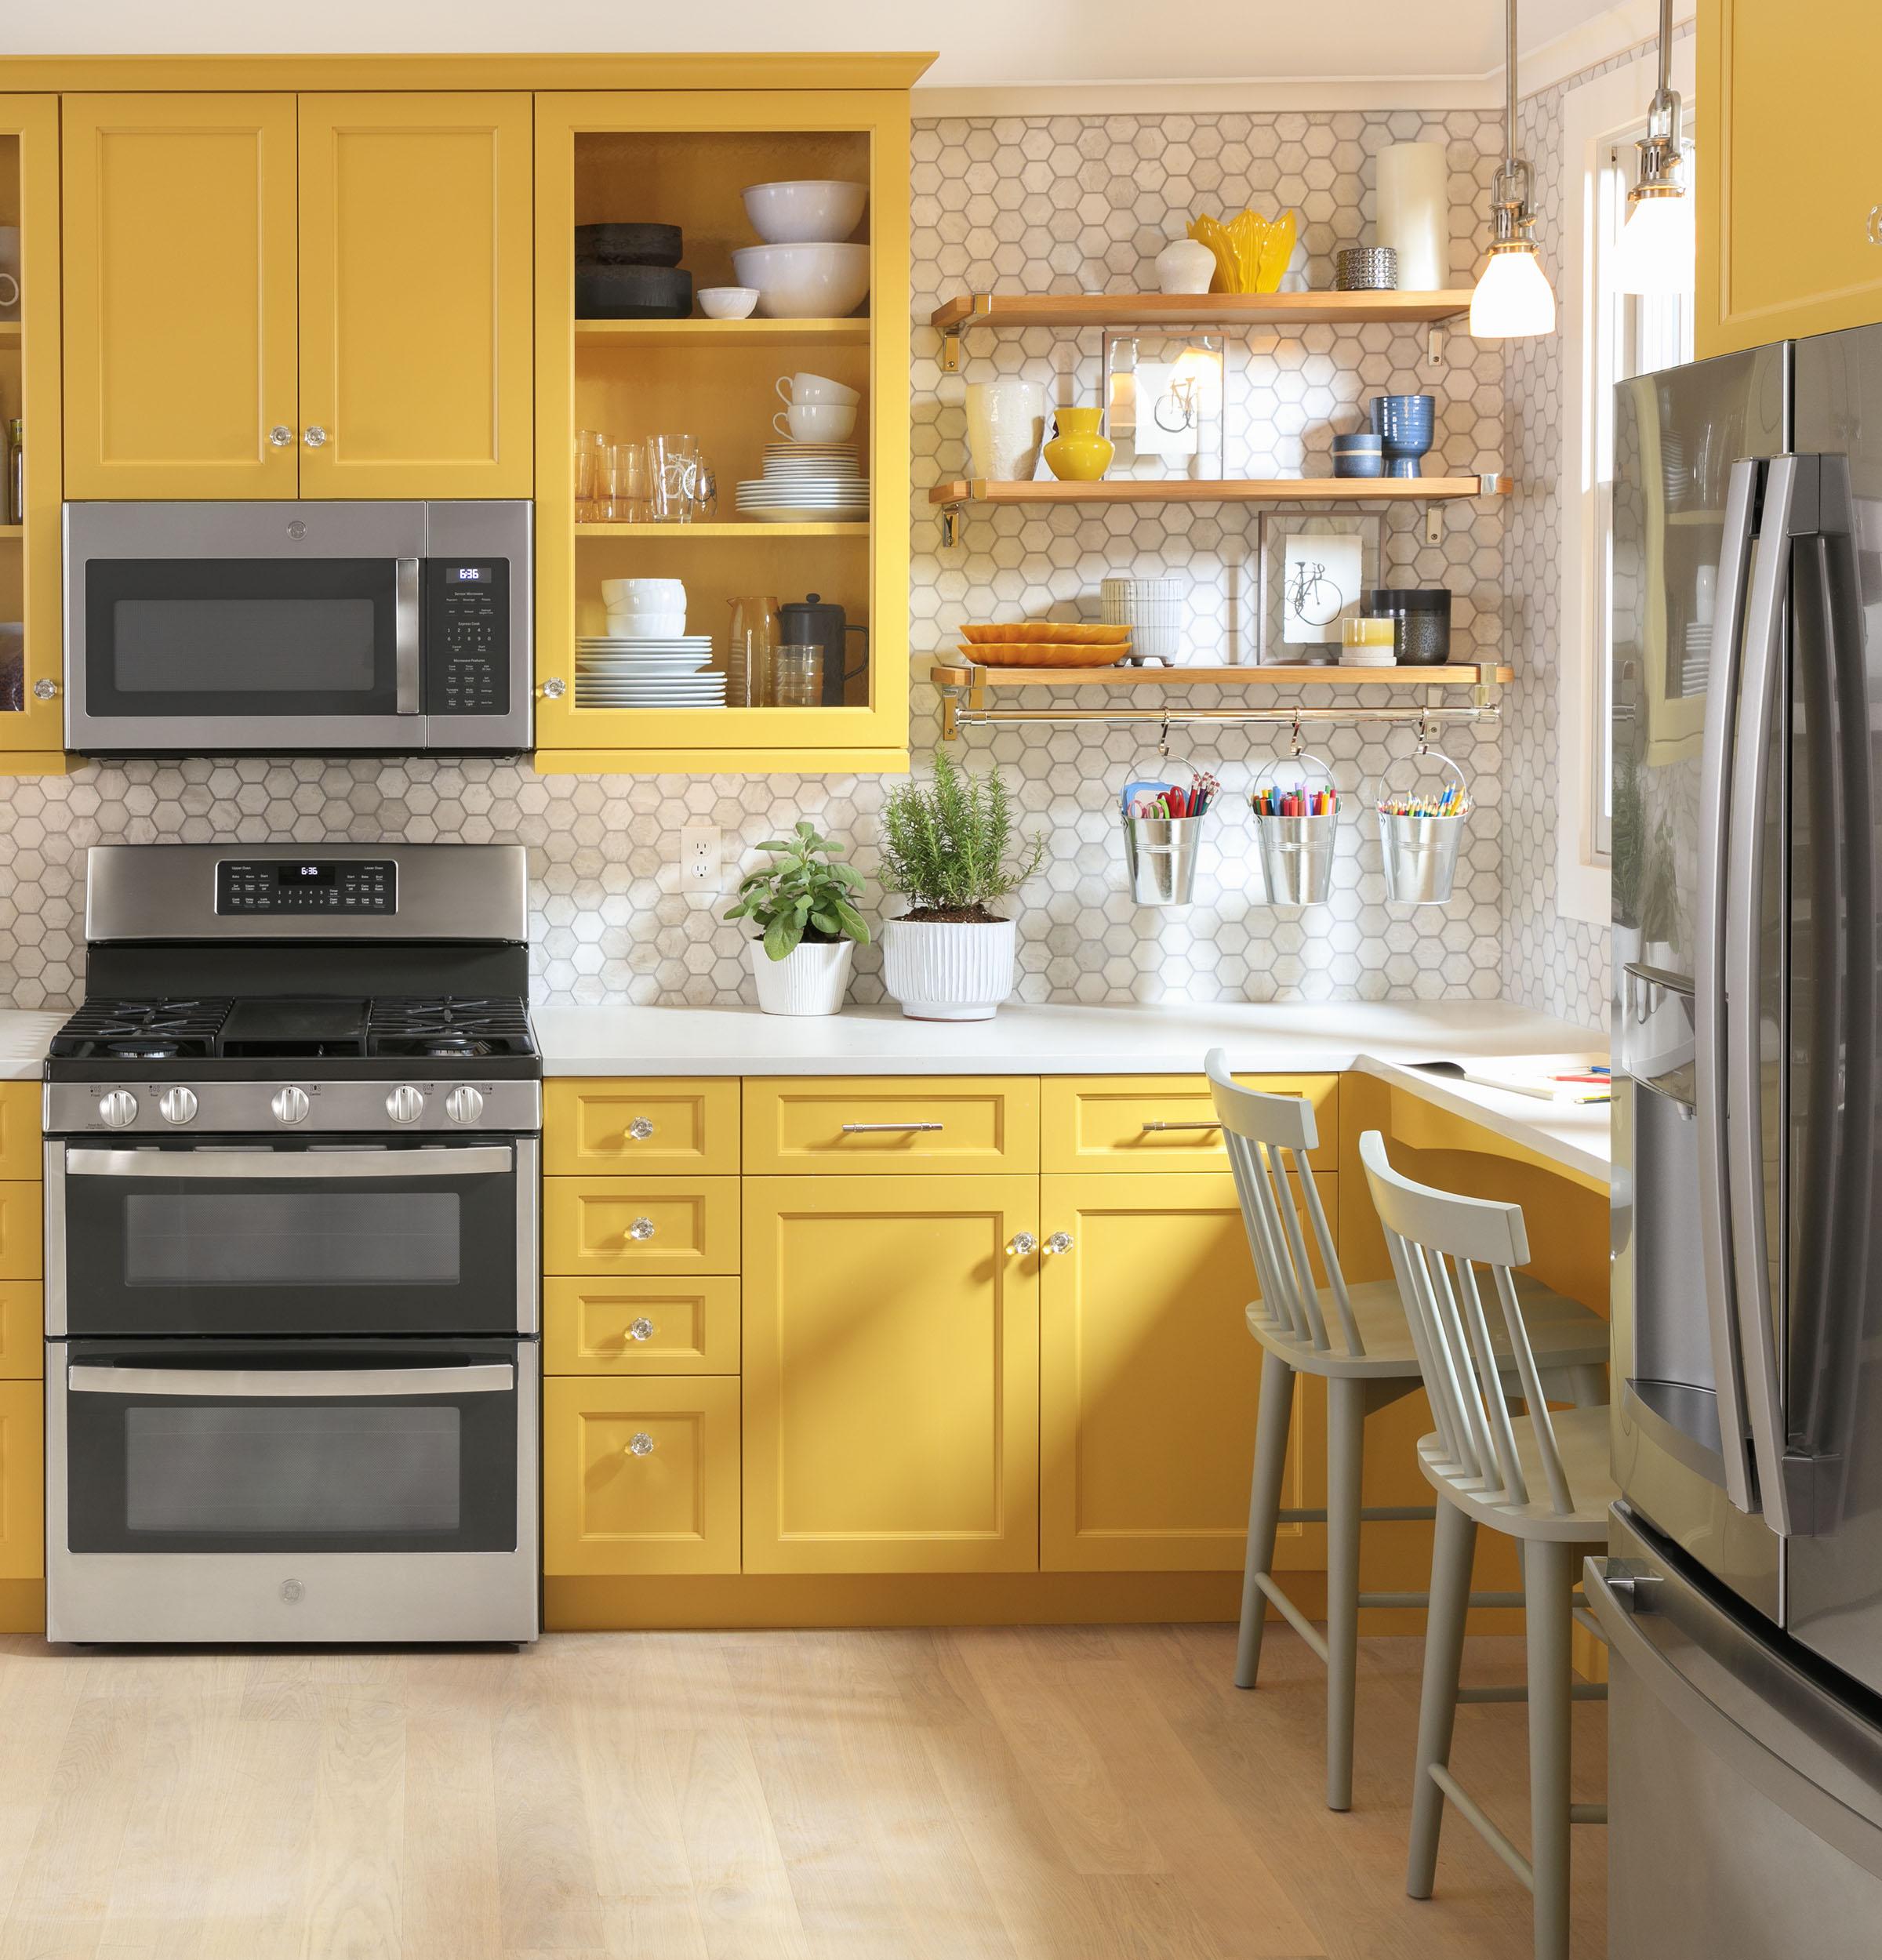 Model: GYE22GYNFS   GE GE® ENERGY STAR® 22.1 Cu. Ft. Counter-Depth Fingerprint Resistant French-Door Refrigerator